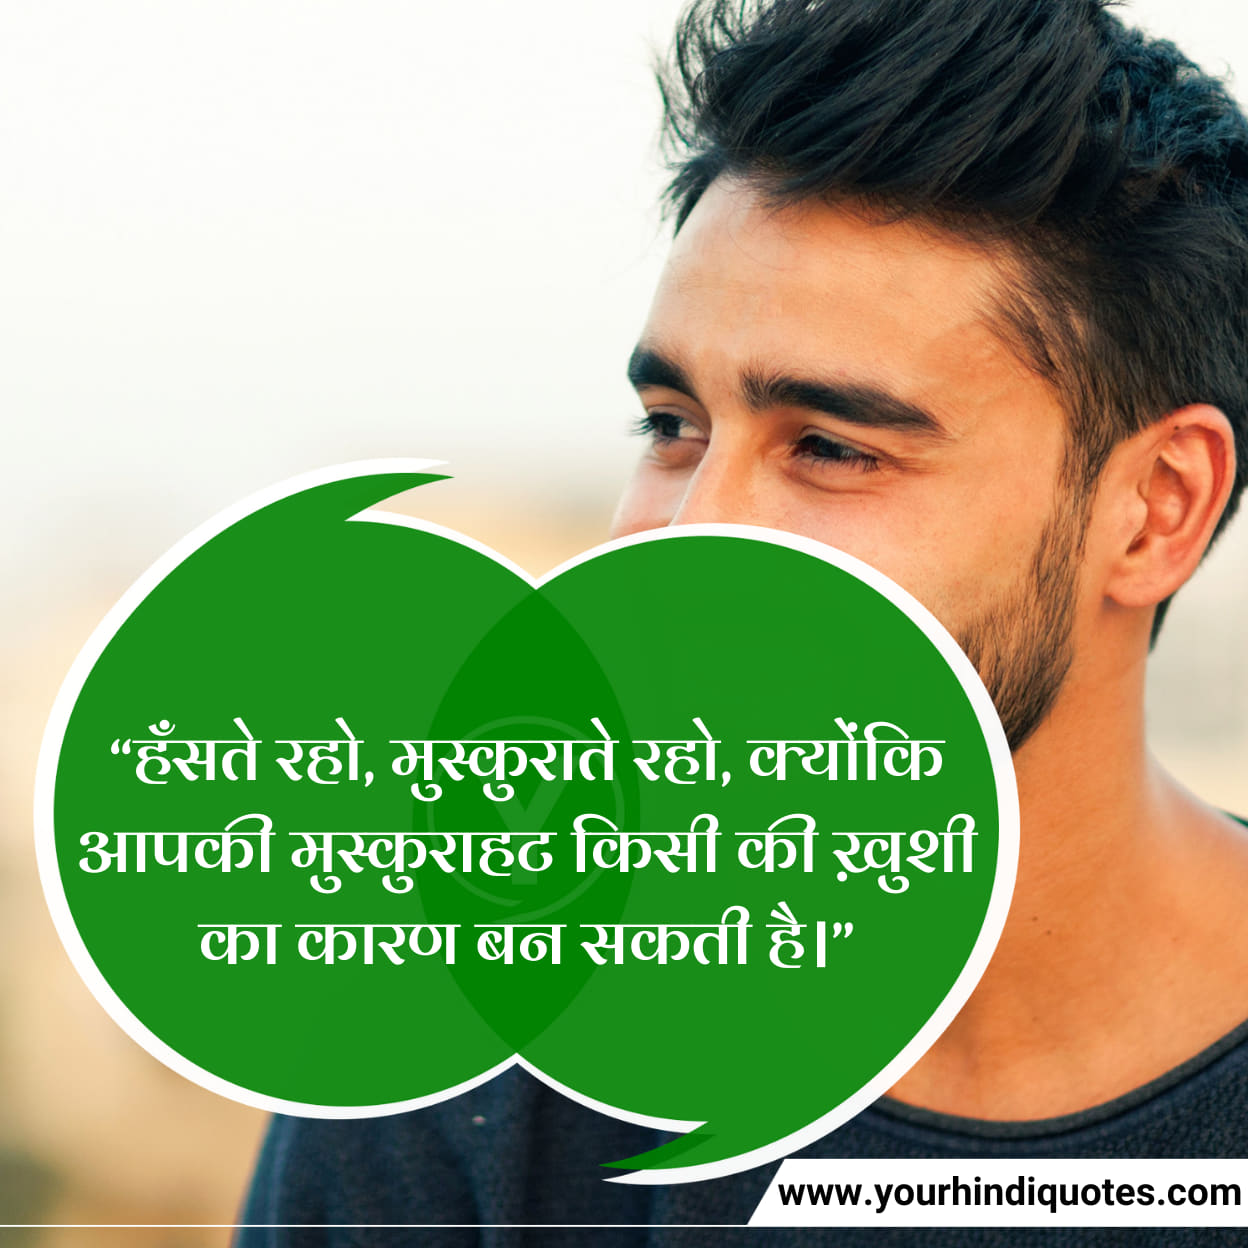 Khushi Smile Quotes In Hindi